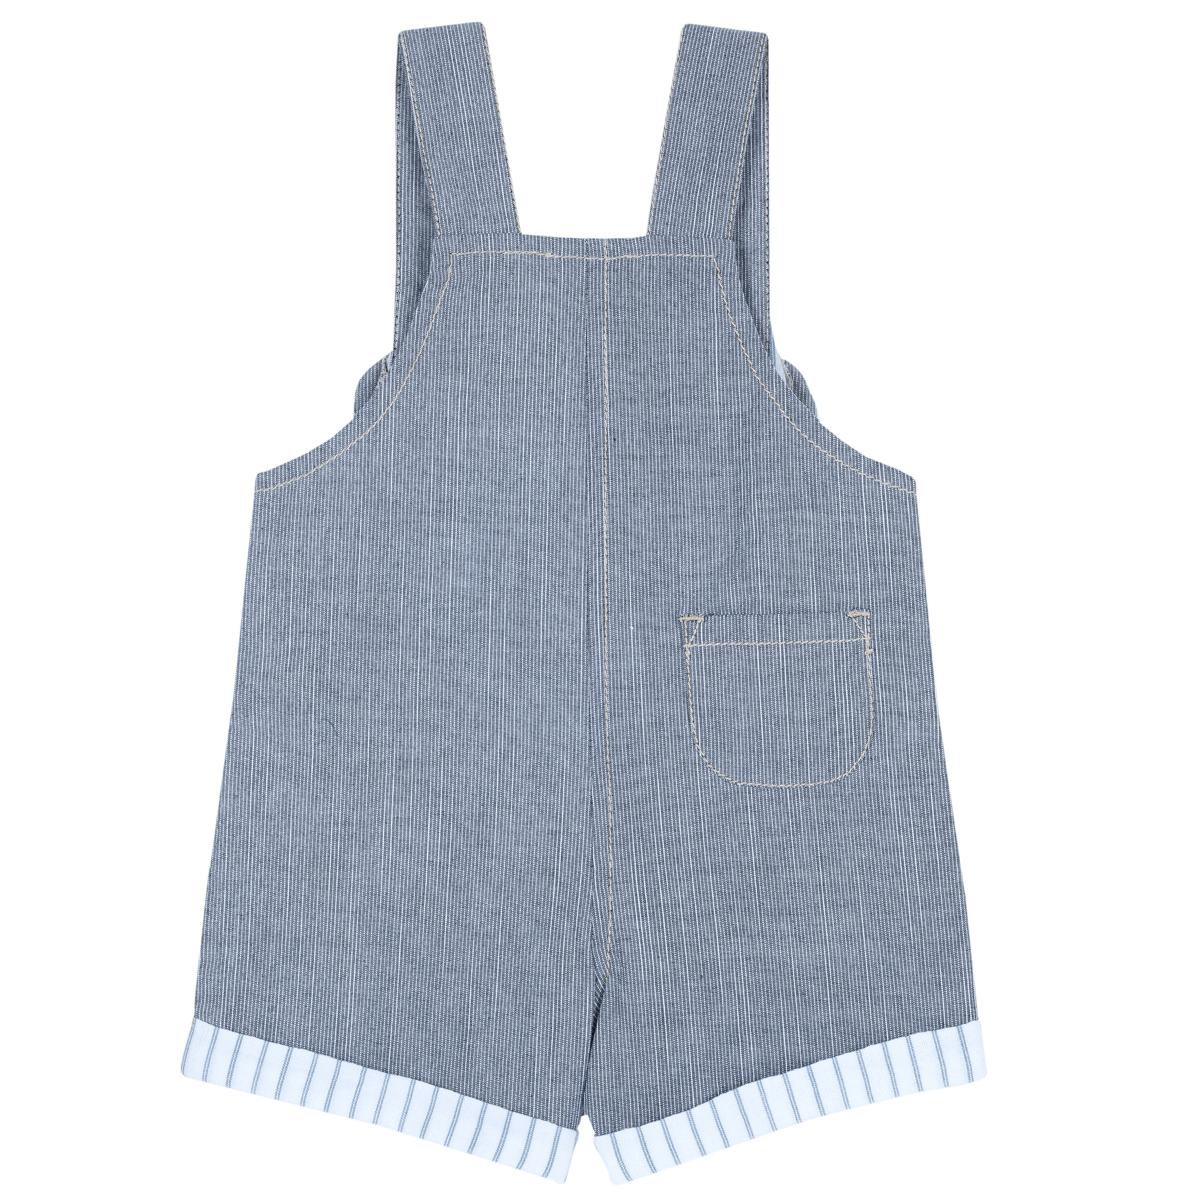 Pantalon Copii Chicco Gen Salopeta, Albastru, 45445 imagine